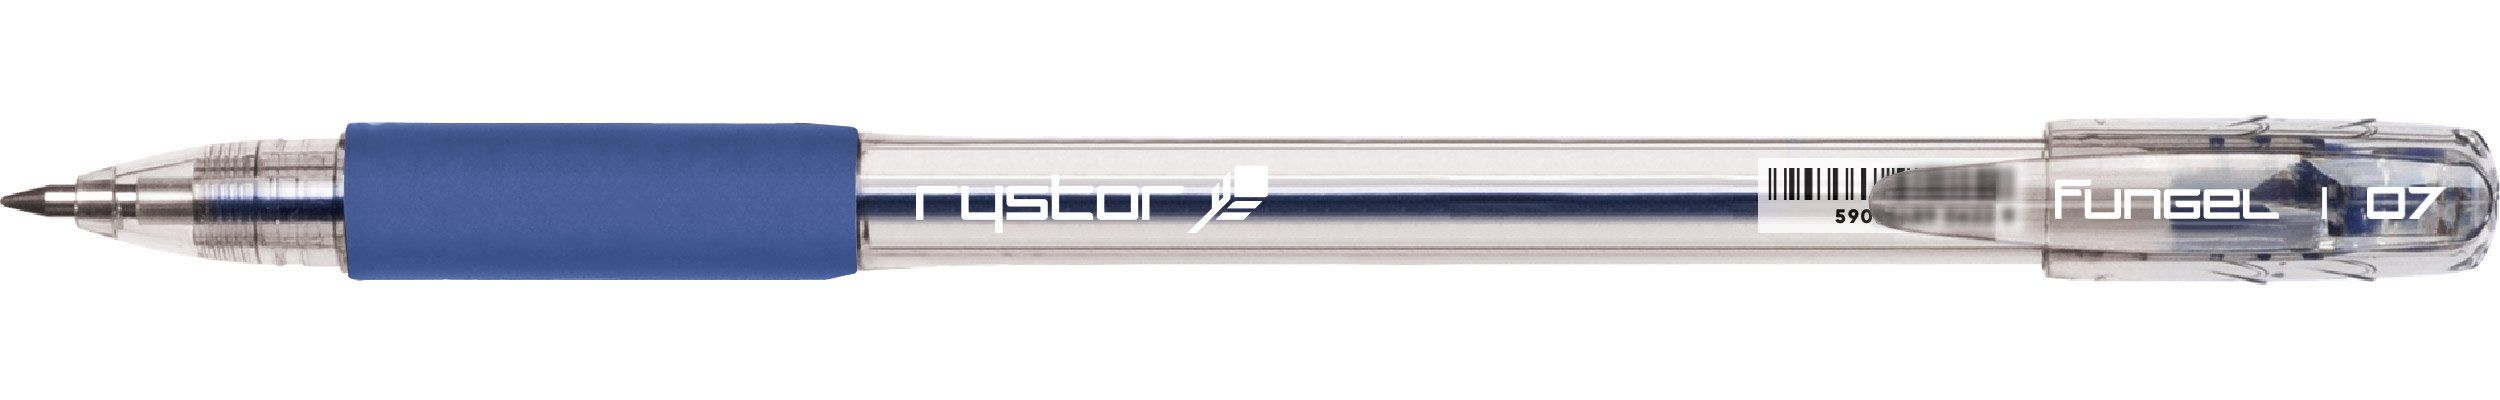 Fun Gel Pen